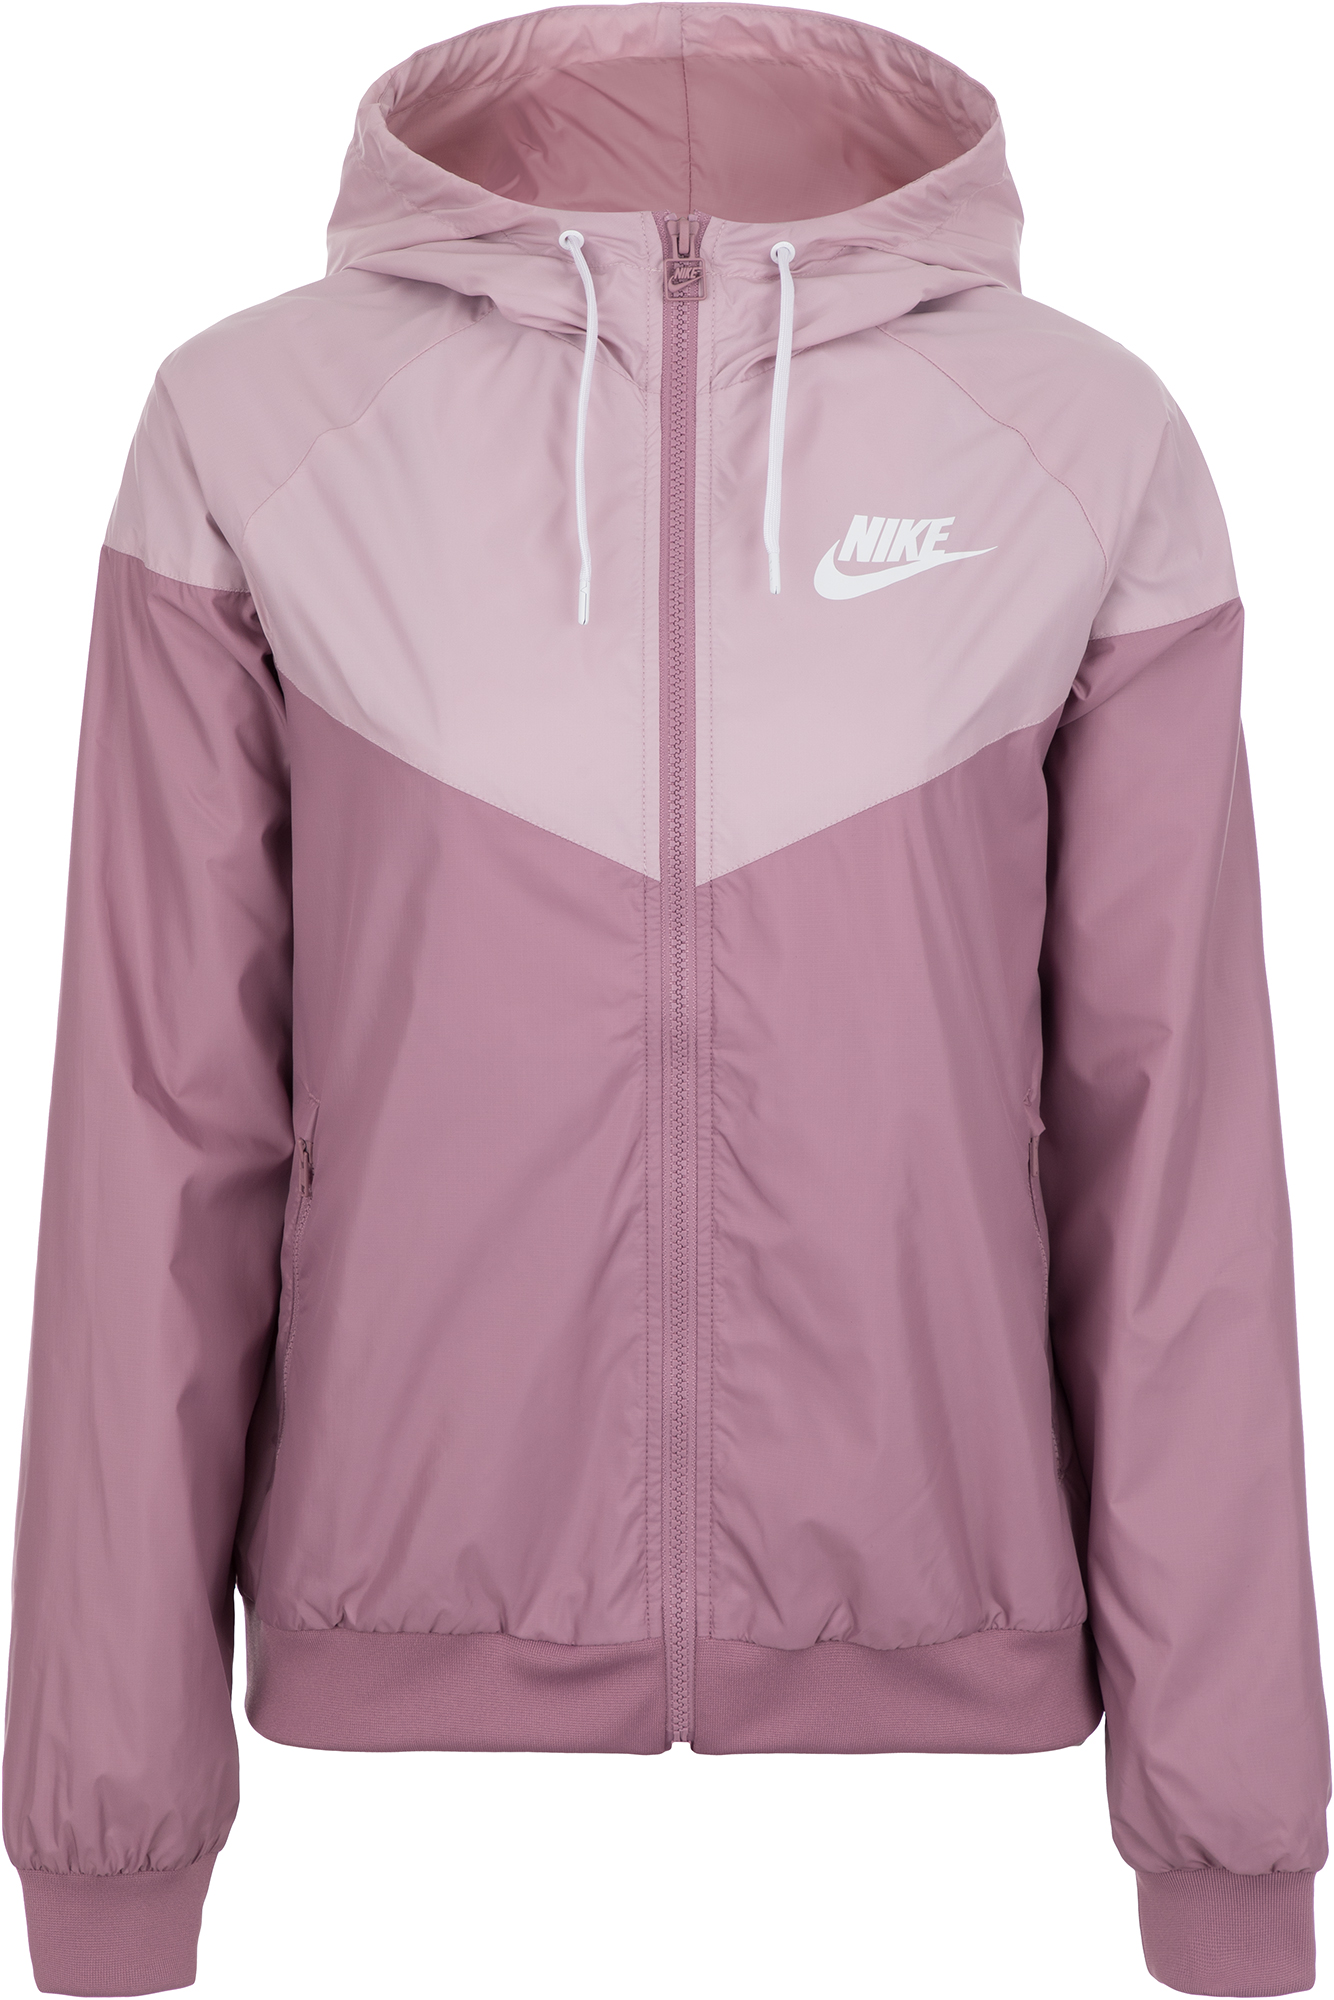 Nike Ветровка женская Nike Sportswear Windrunner, размер 48-50